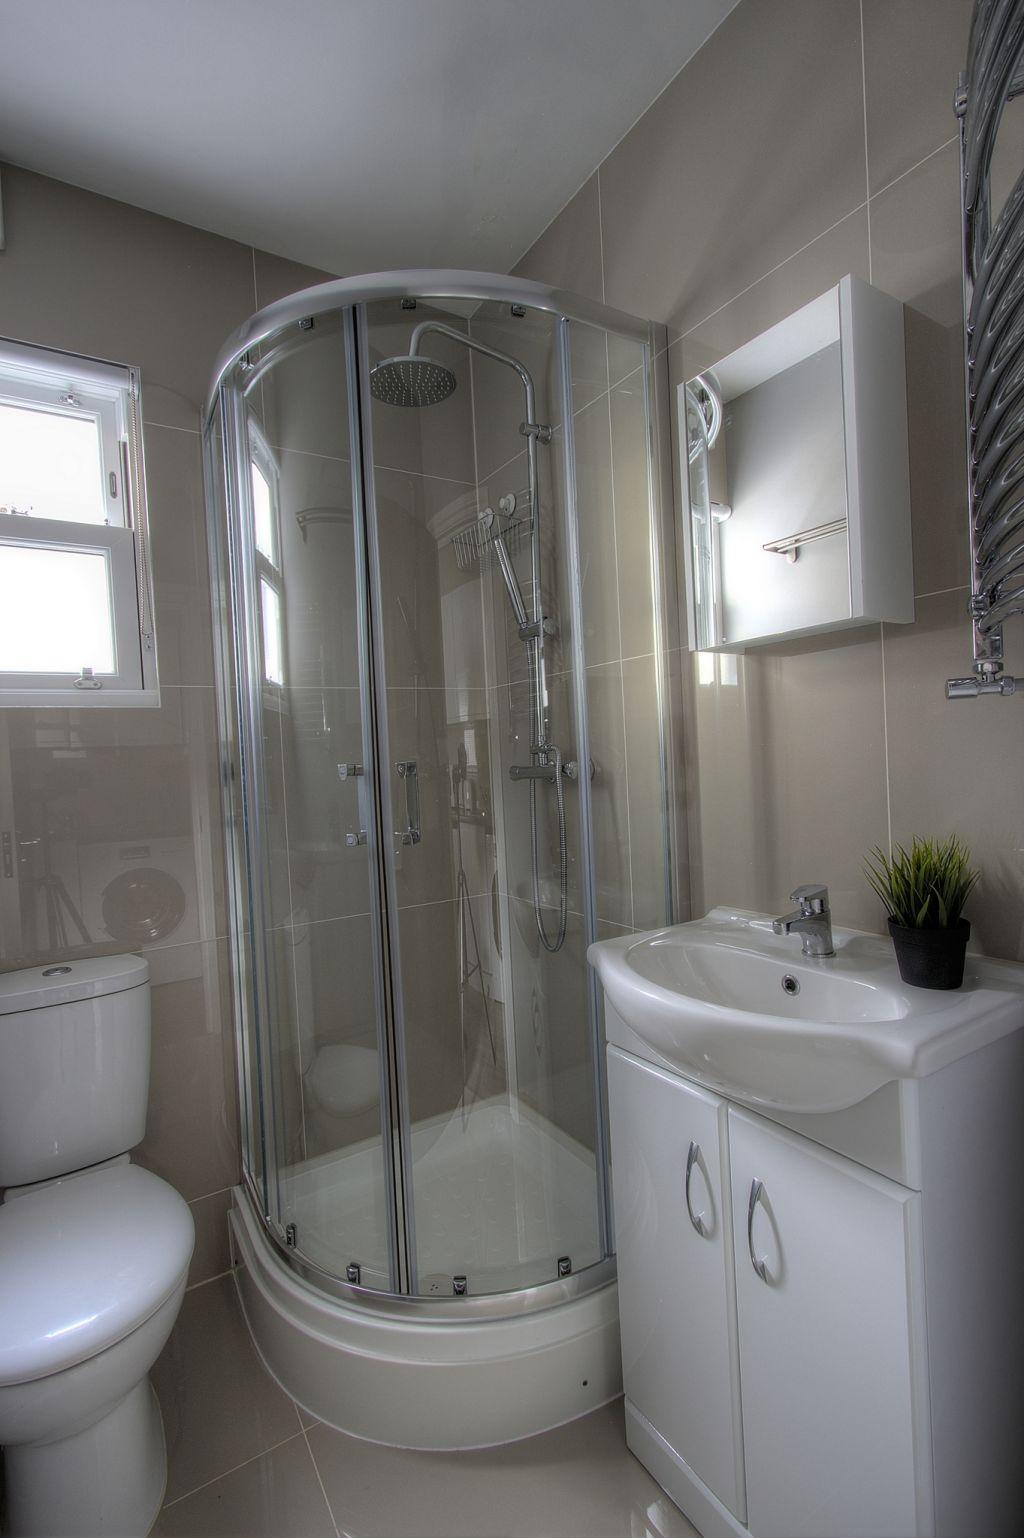 image 4 furnished 1 bedroom Apartment for rent in Cricklewood, Barnet